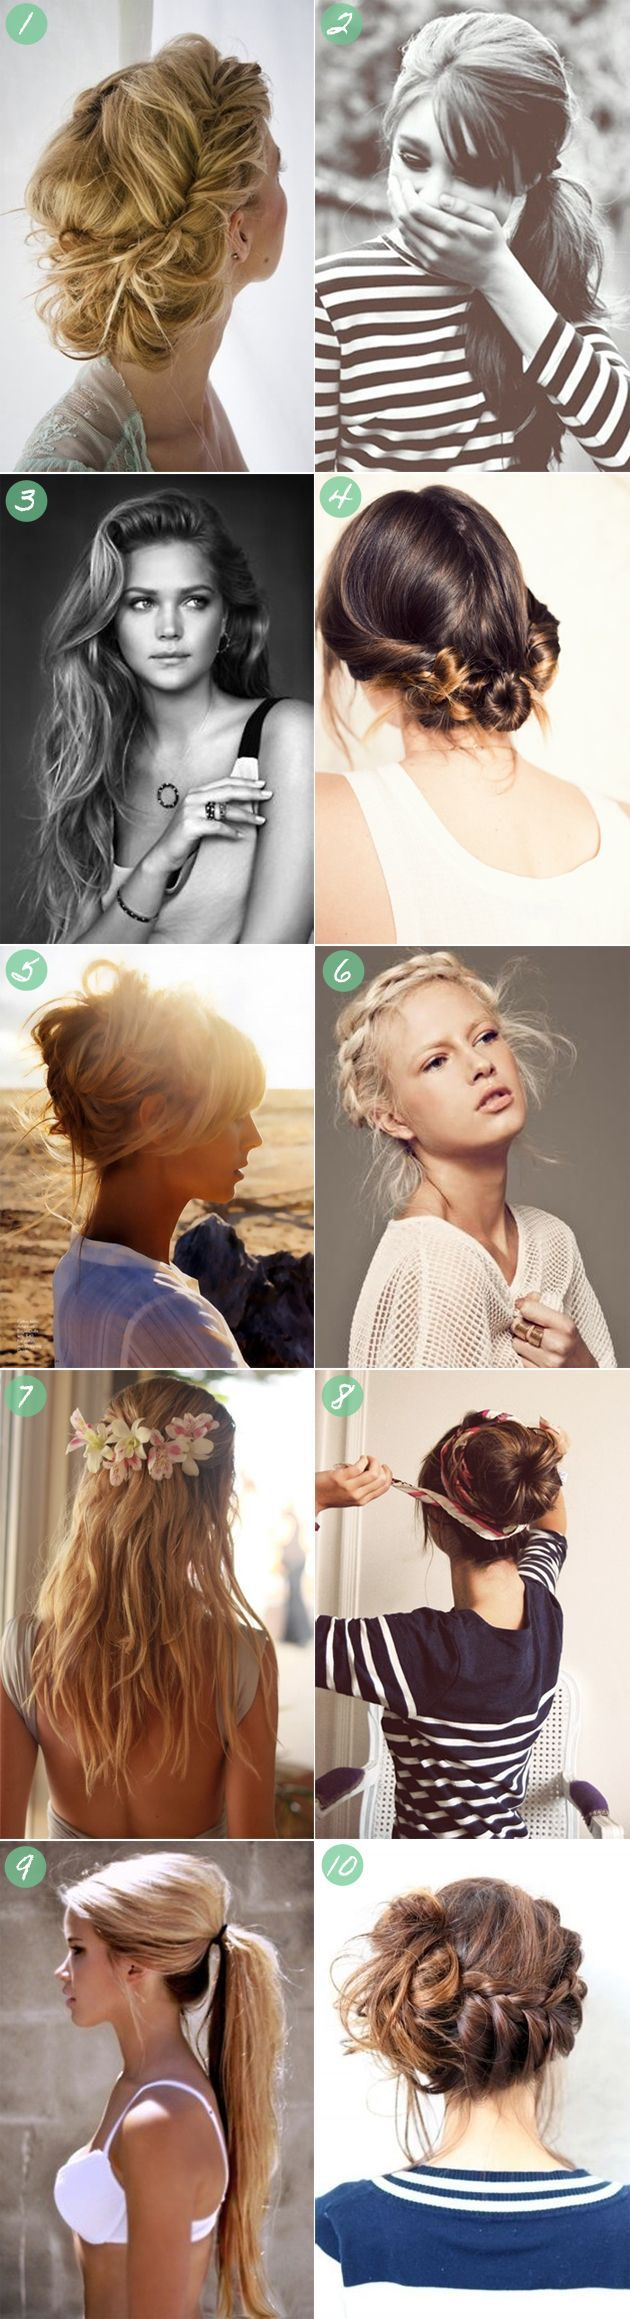 Half Up Half Down Hairstyles for Long, Short and Medium Hair